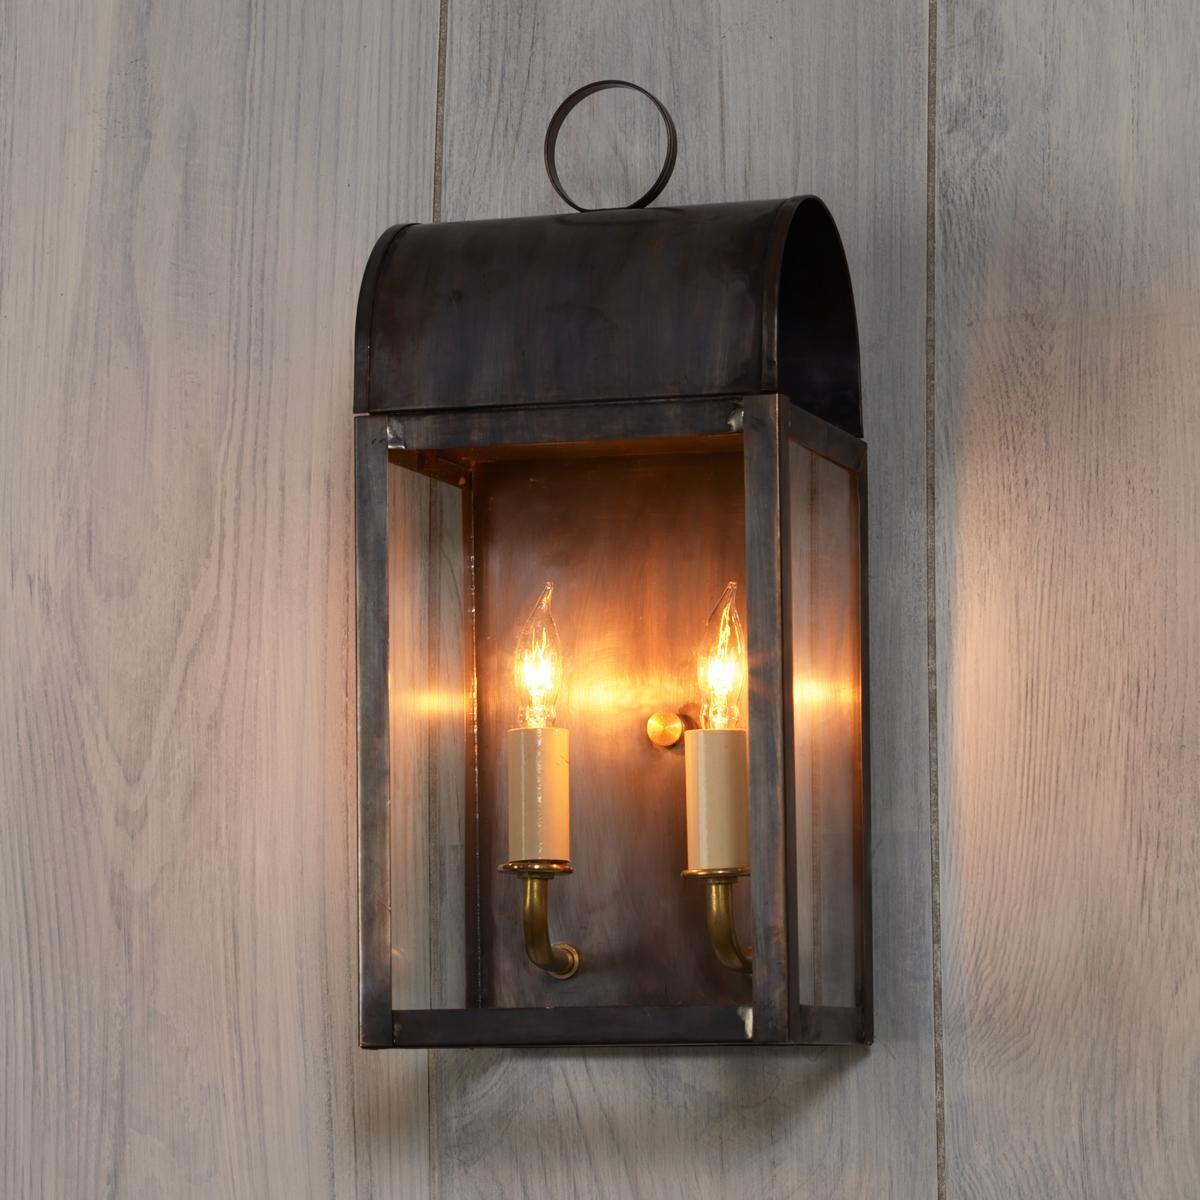 Arched Outdoor Light 2 Light Exterior Light Fixtures Outdoor